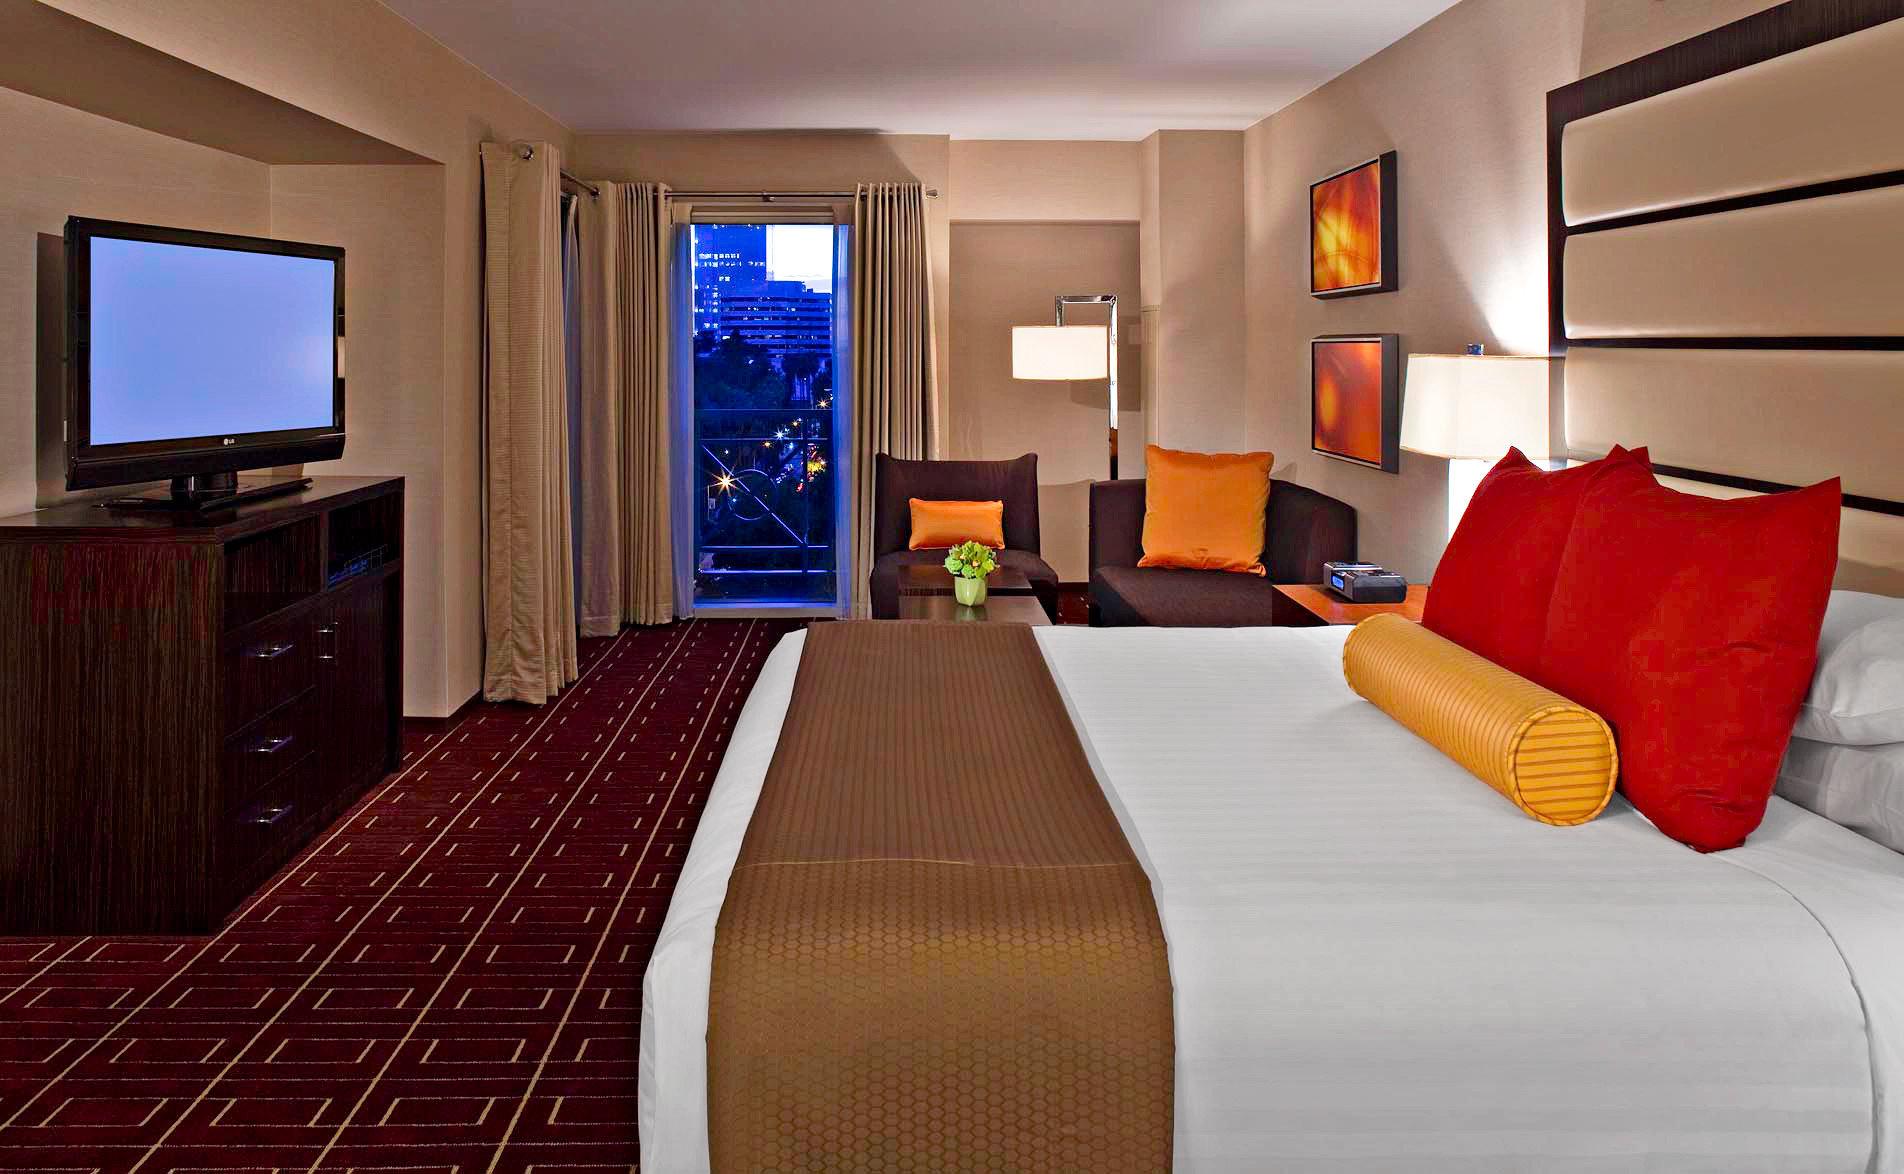 Bedroom Hip Lounge Luxury Modern Suite sofa property living room cottage orange flat